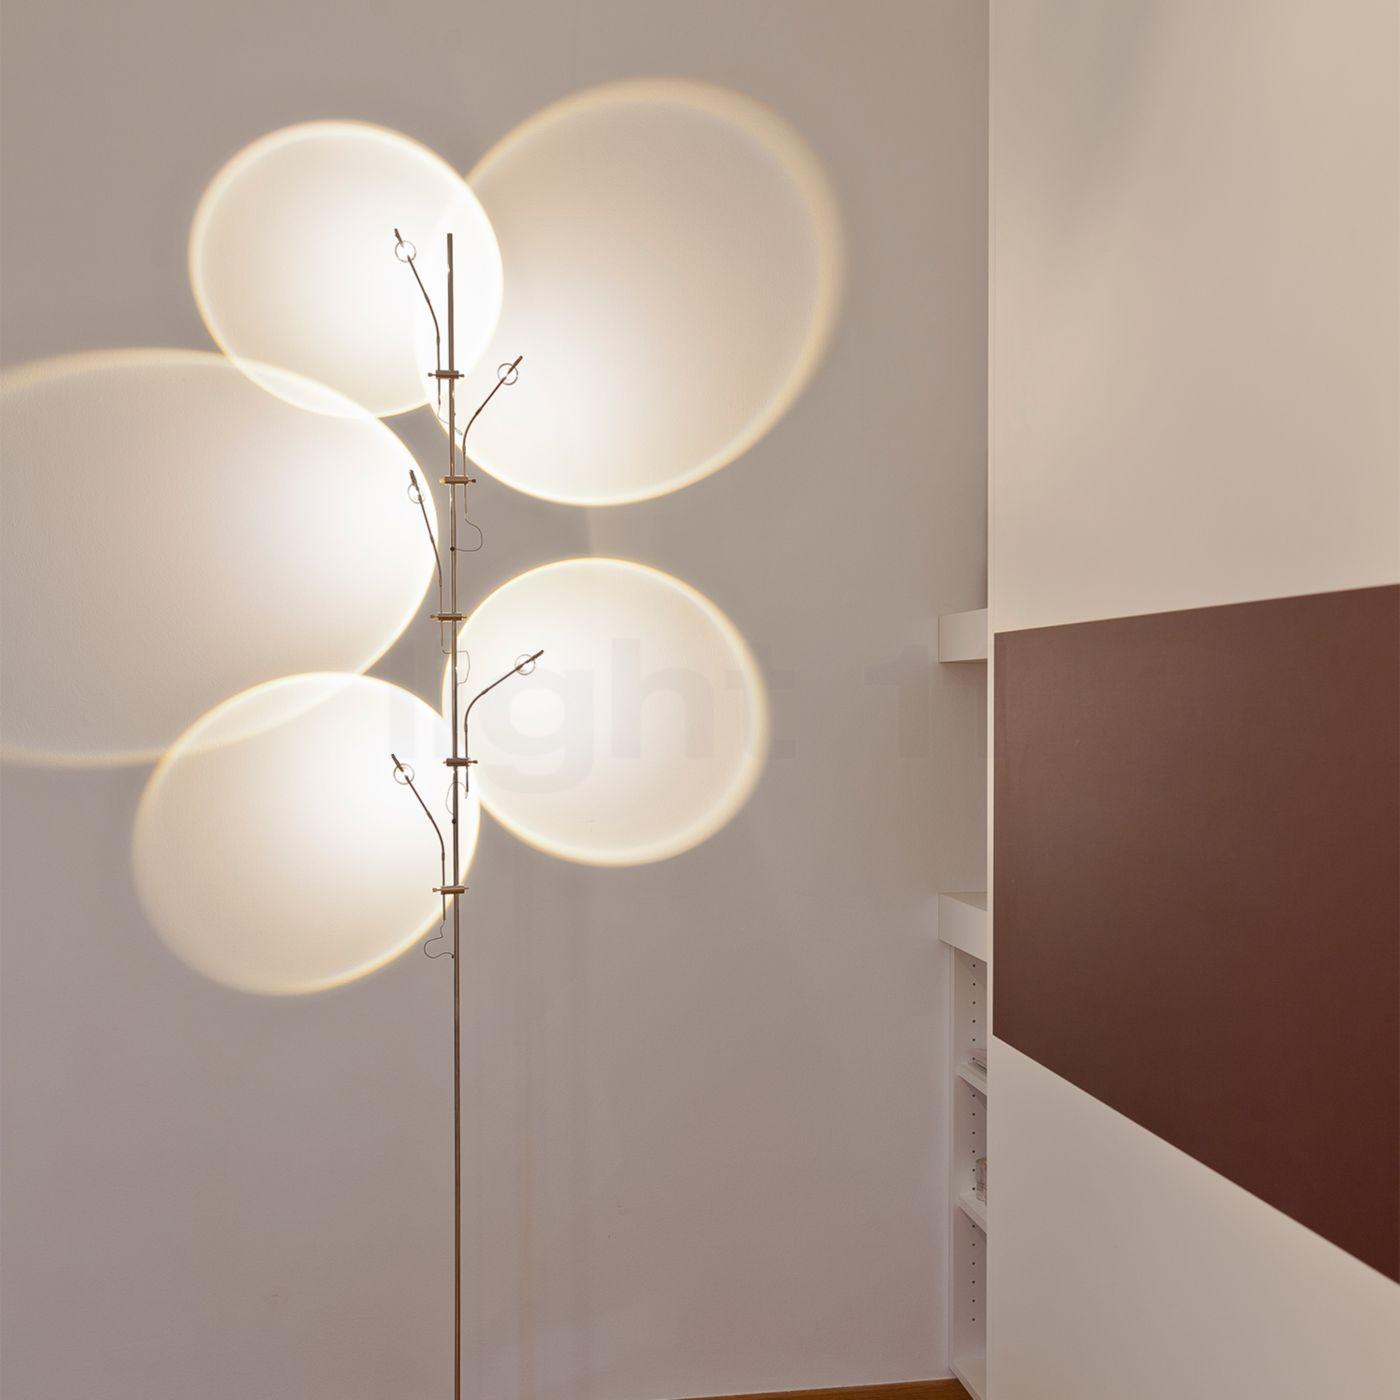 Catellani & Smith WA WA Terra Stehleuchte - light11.de